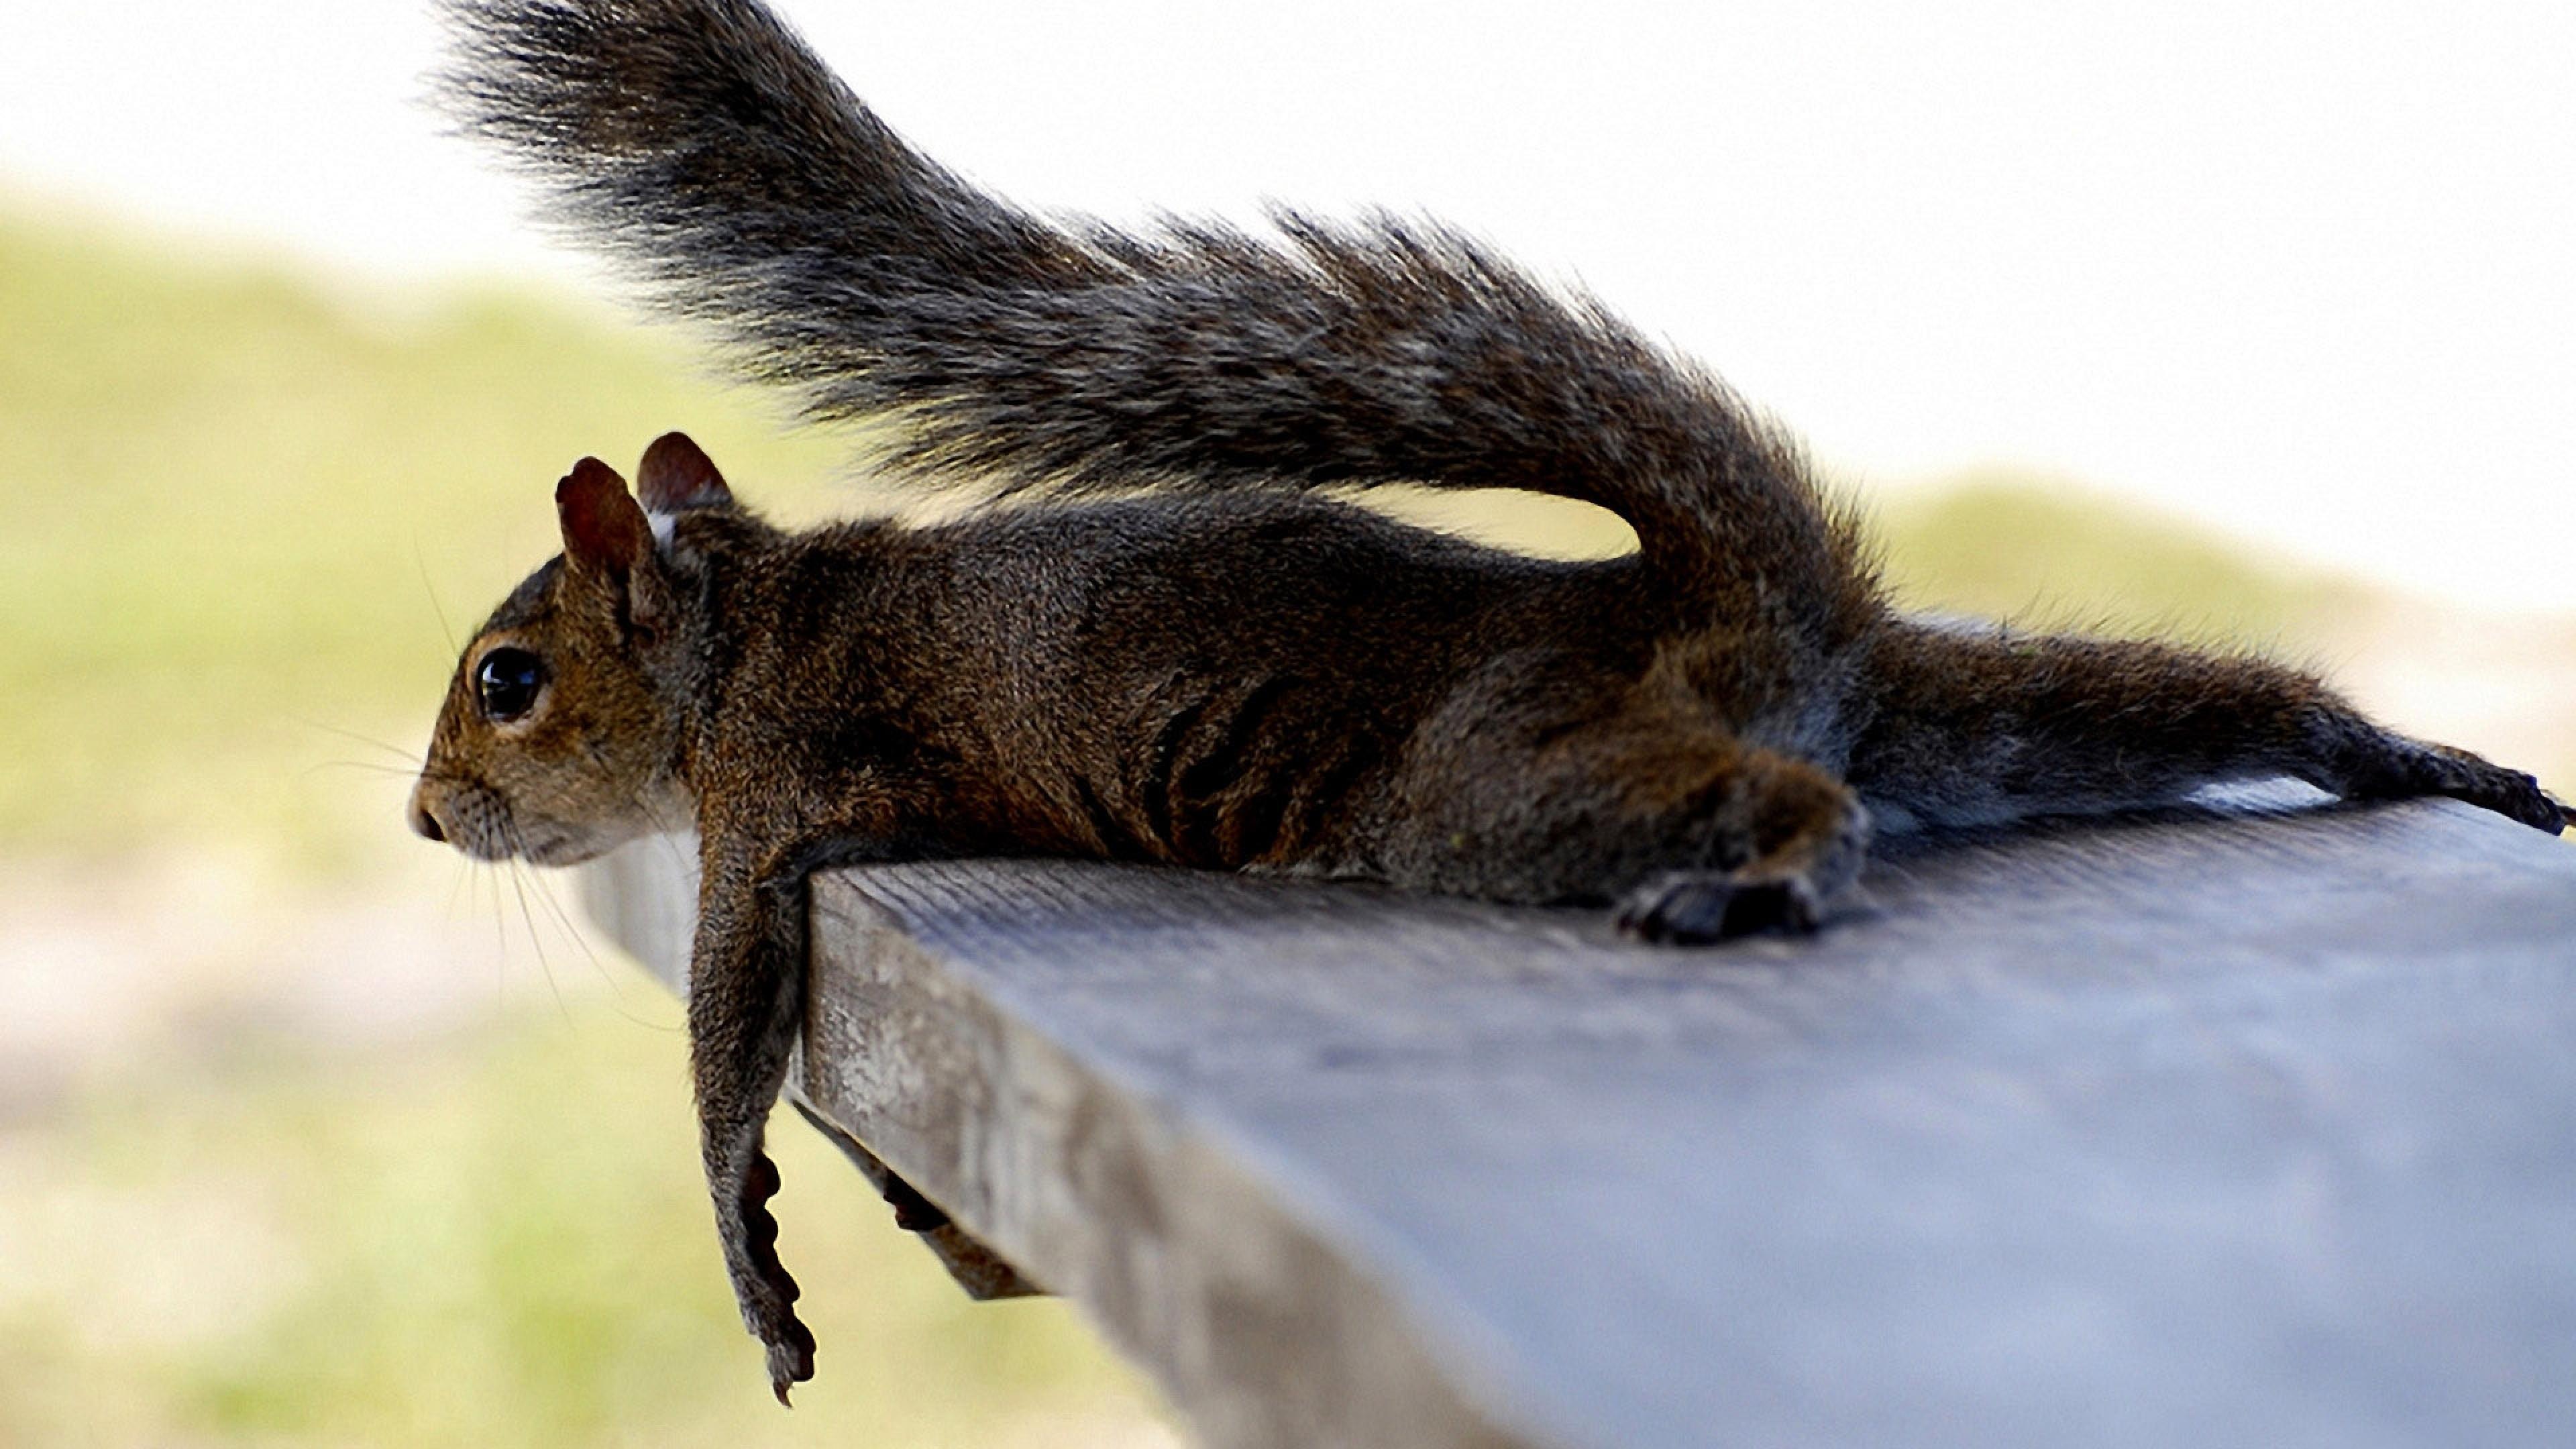 squirrel_lying_mammal_tired_ultra_3840x2160_hd-wallpaper-69799